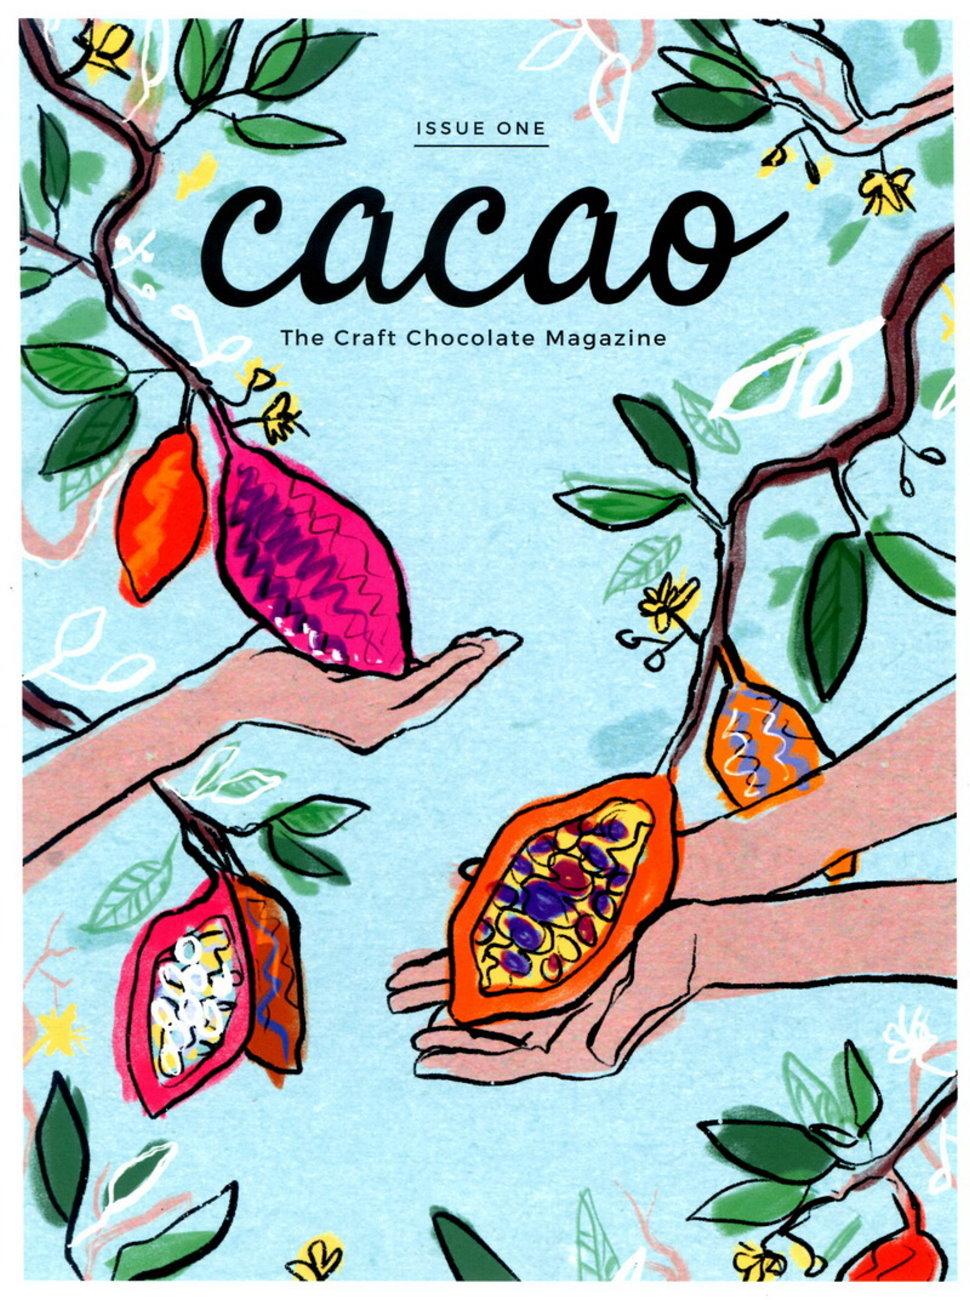 cacao 第1期 春夏號/2...